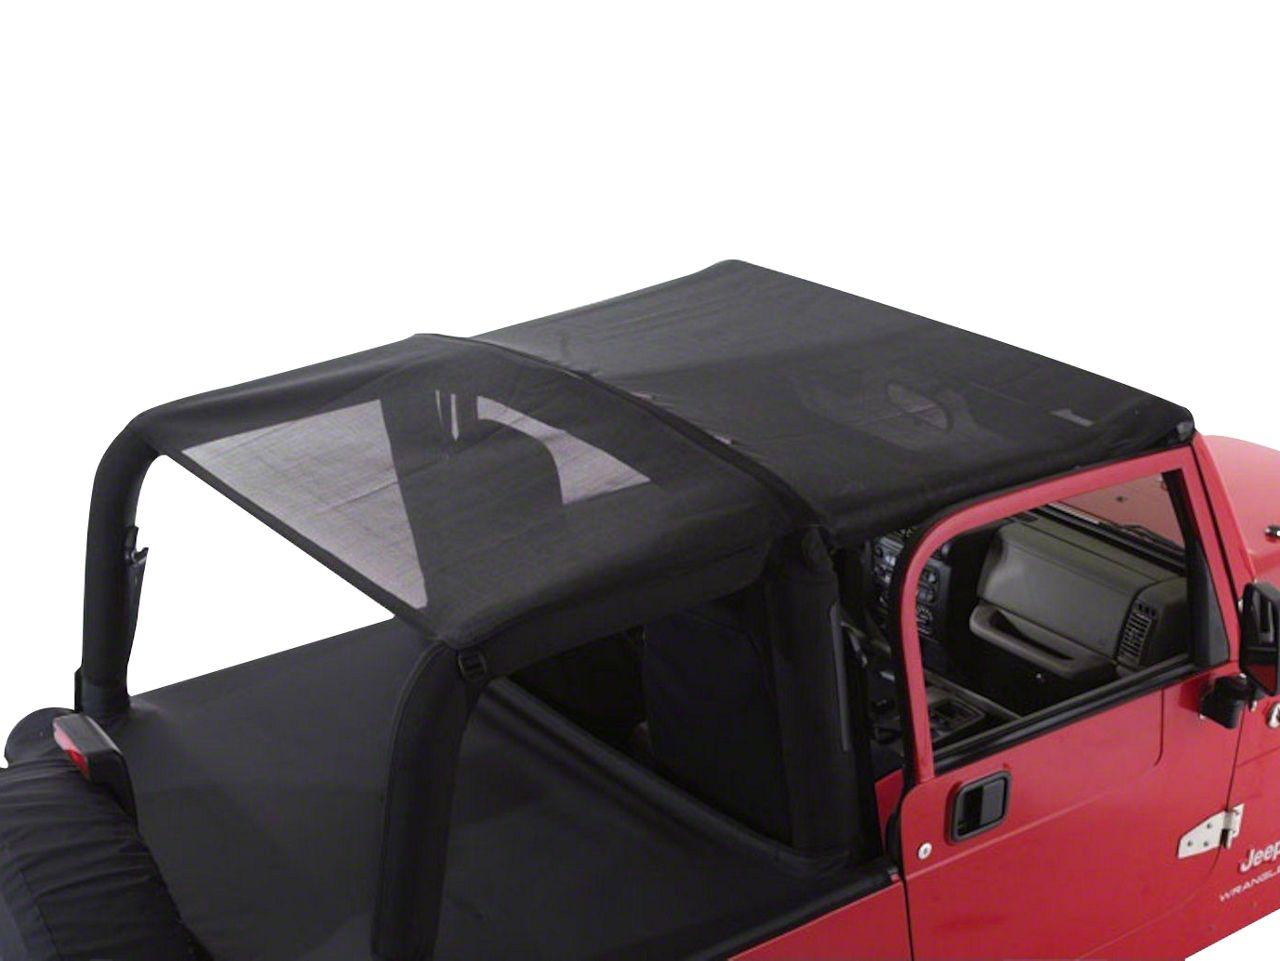 RT Off-Road Combo Beach Topper - Black Mesh (92-95 Jeep Wrangler YJ)